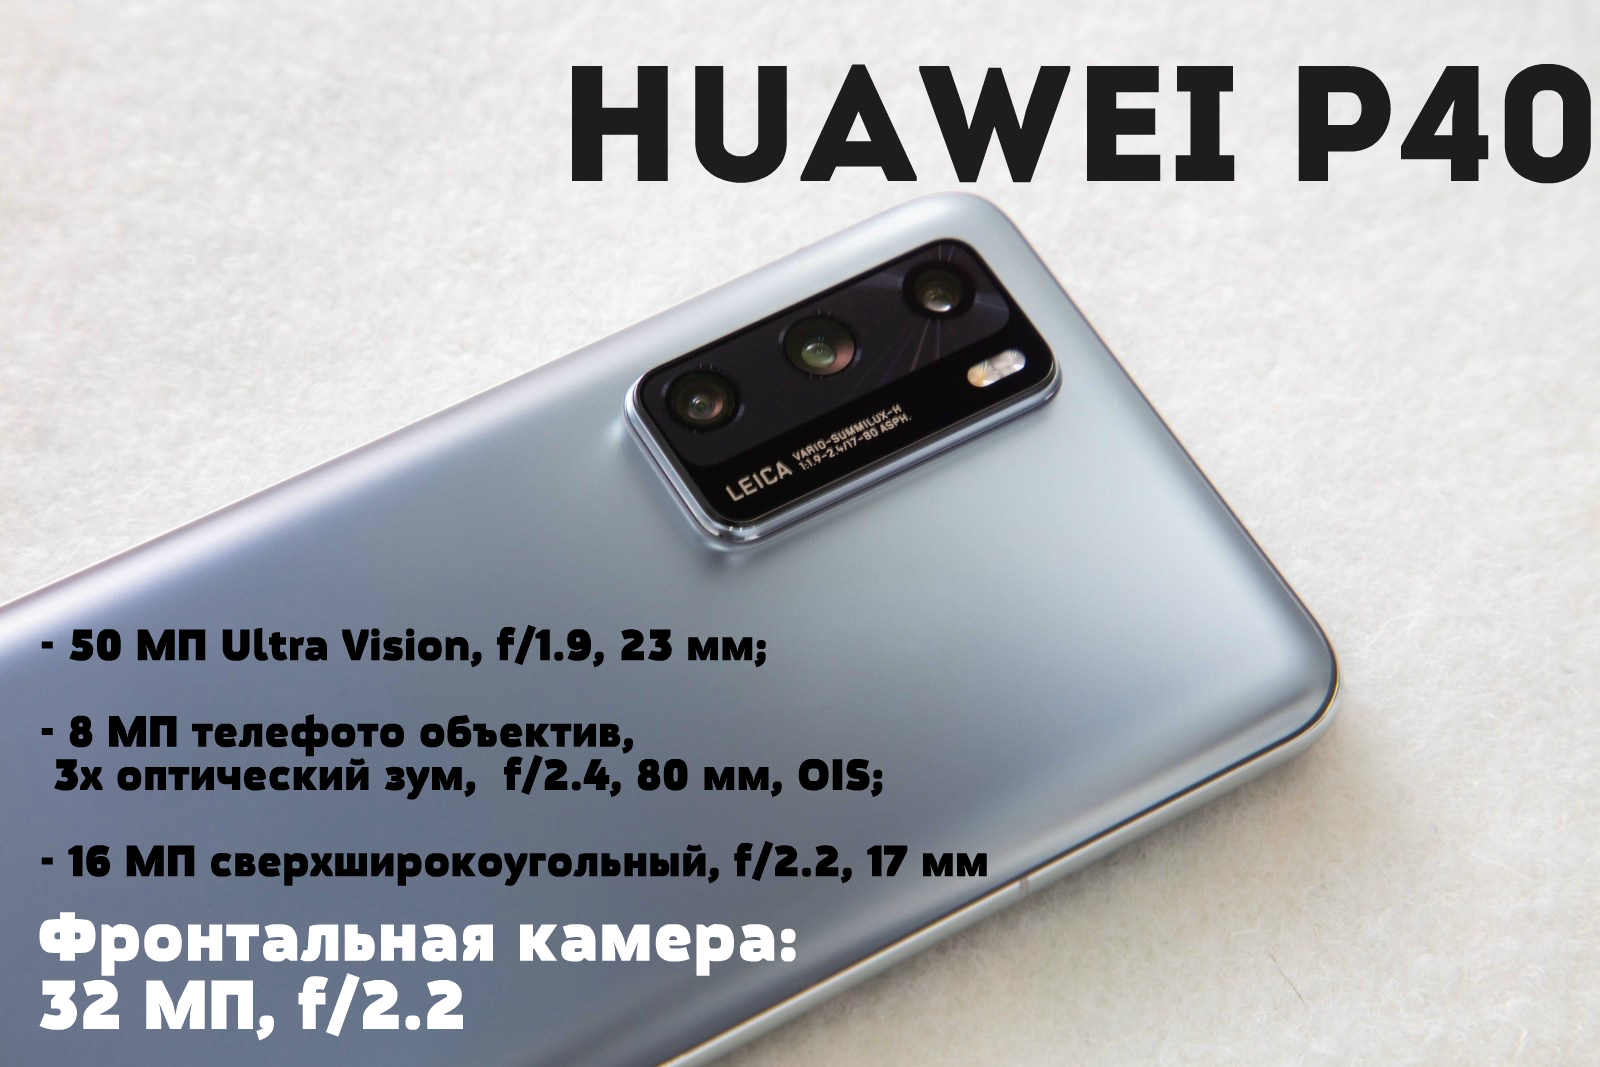 характеристики камеры Huawei P40